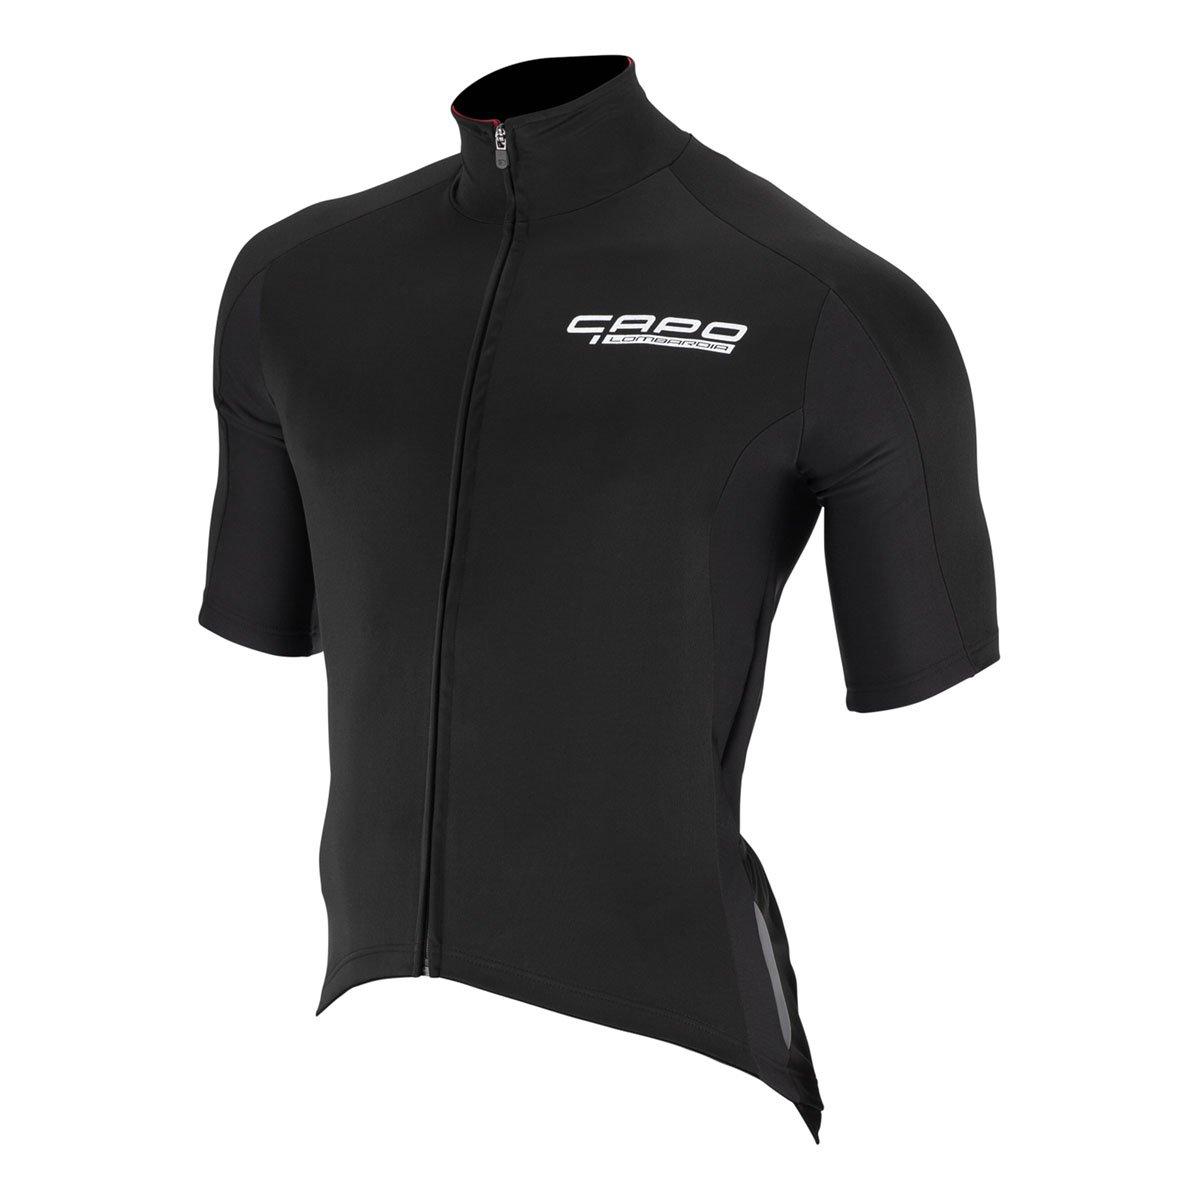 Amazon.com   Capo Lombardia DWR Jersey - Men s Black 768a8c107